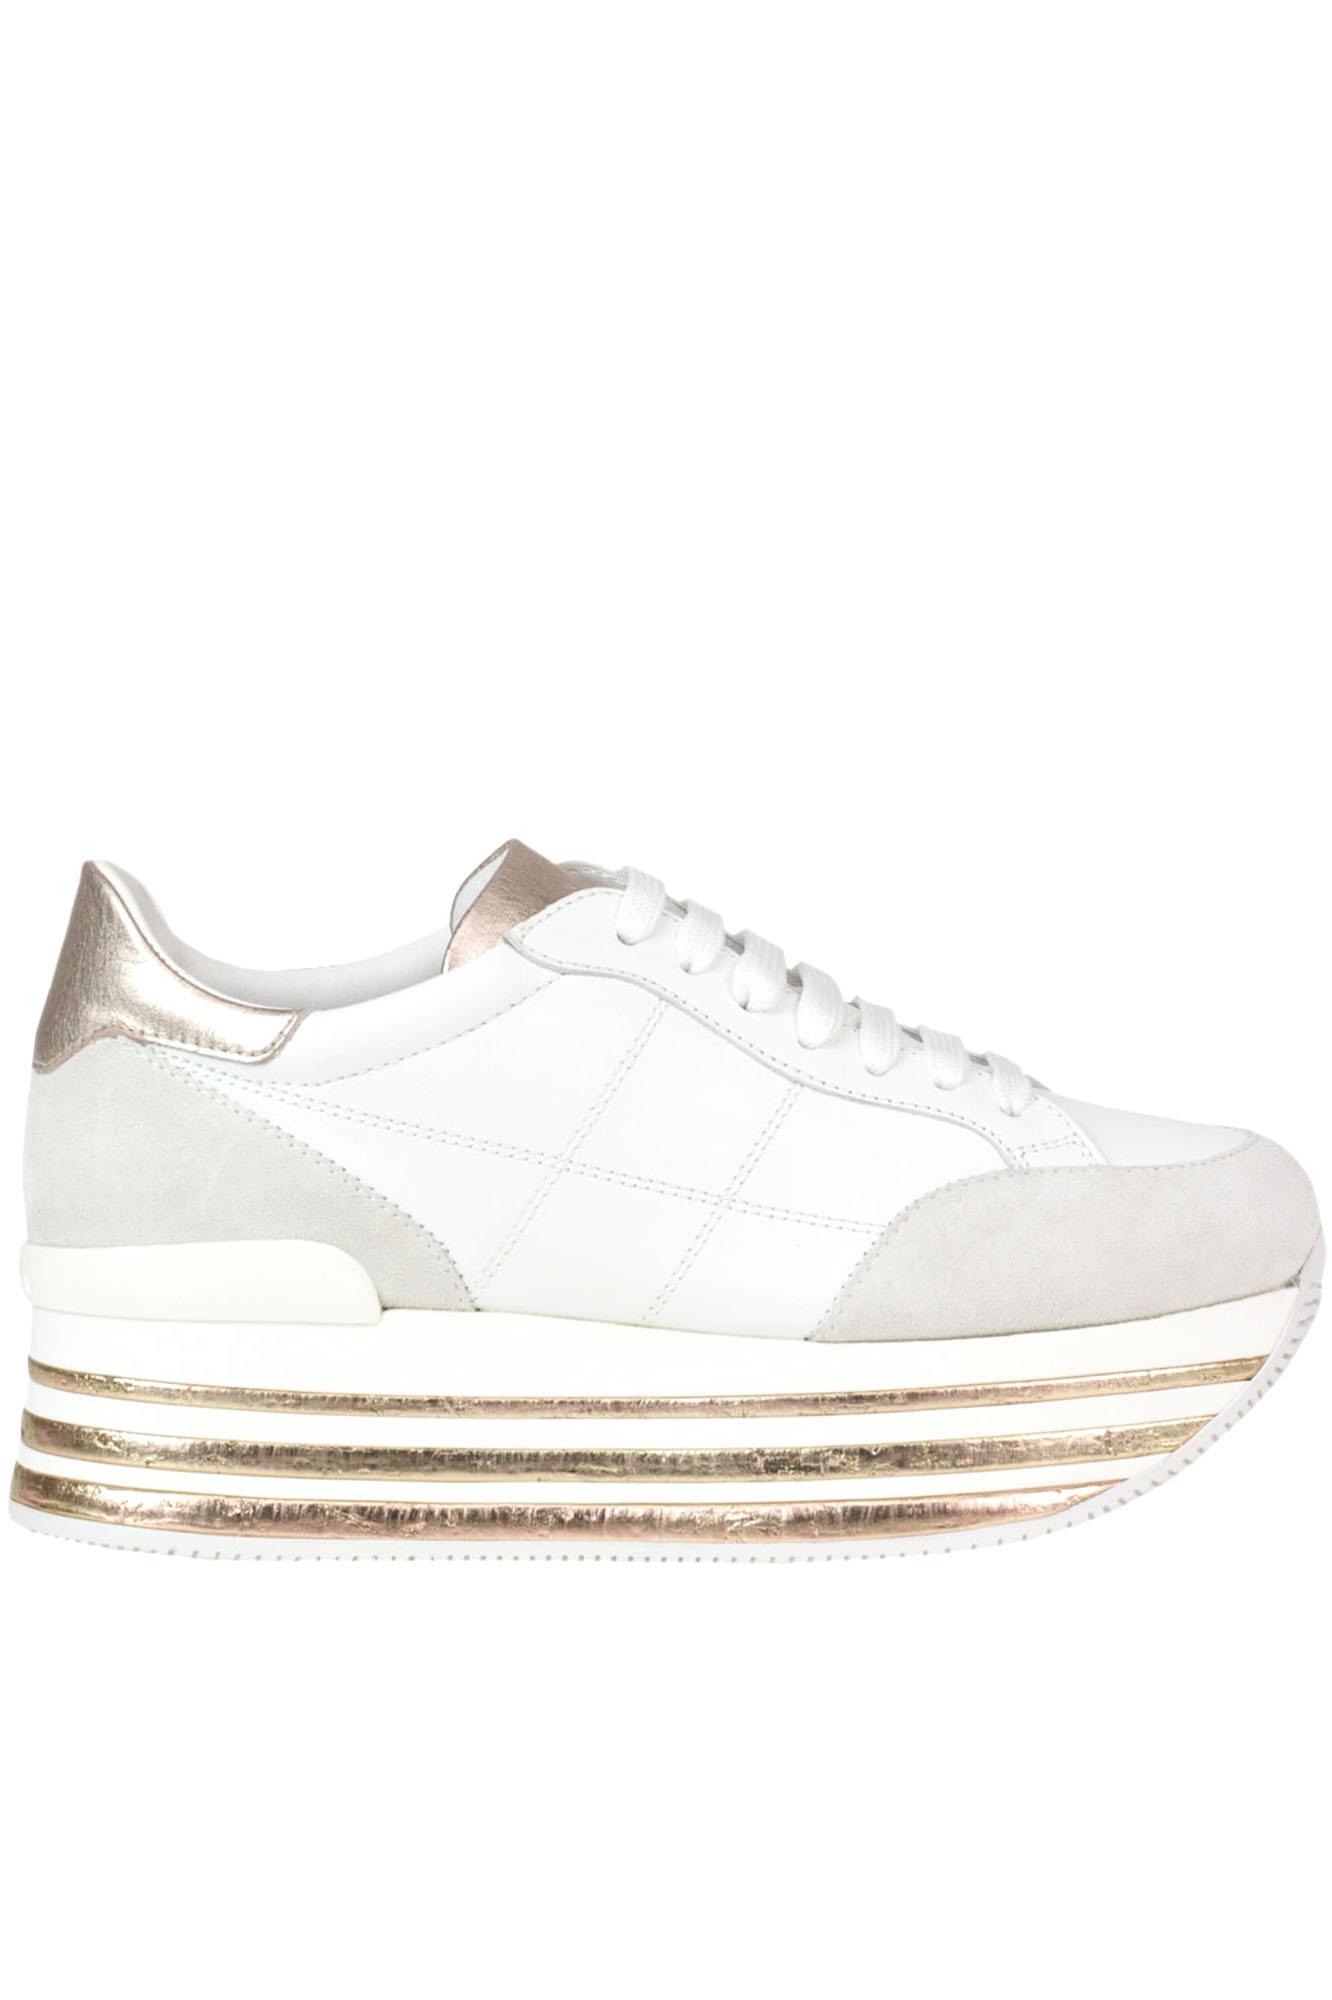 17e441f5bf Hogan 'Maxi 222' Wedge Sneakers In White | ModeSens